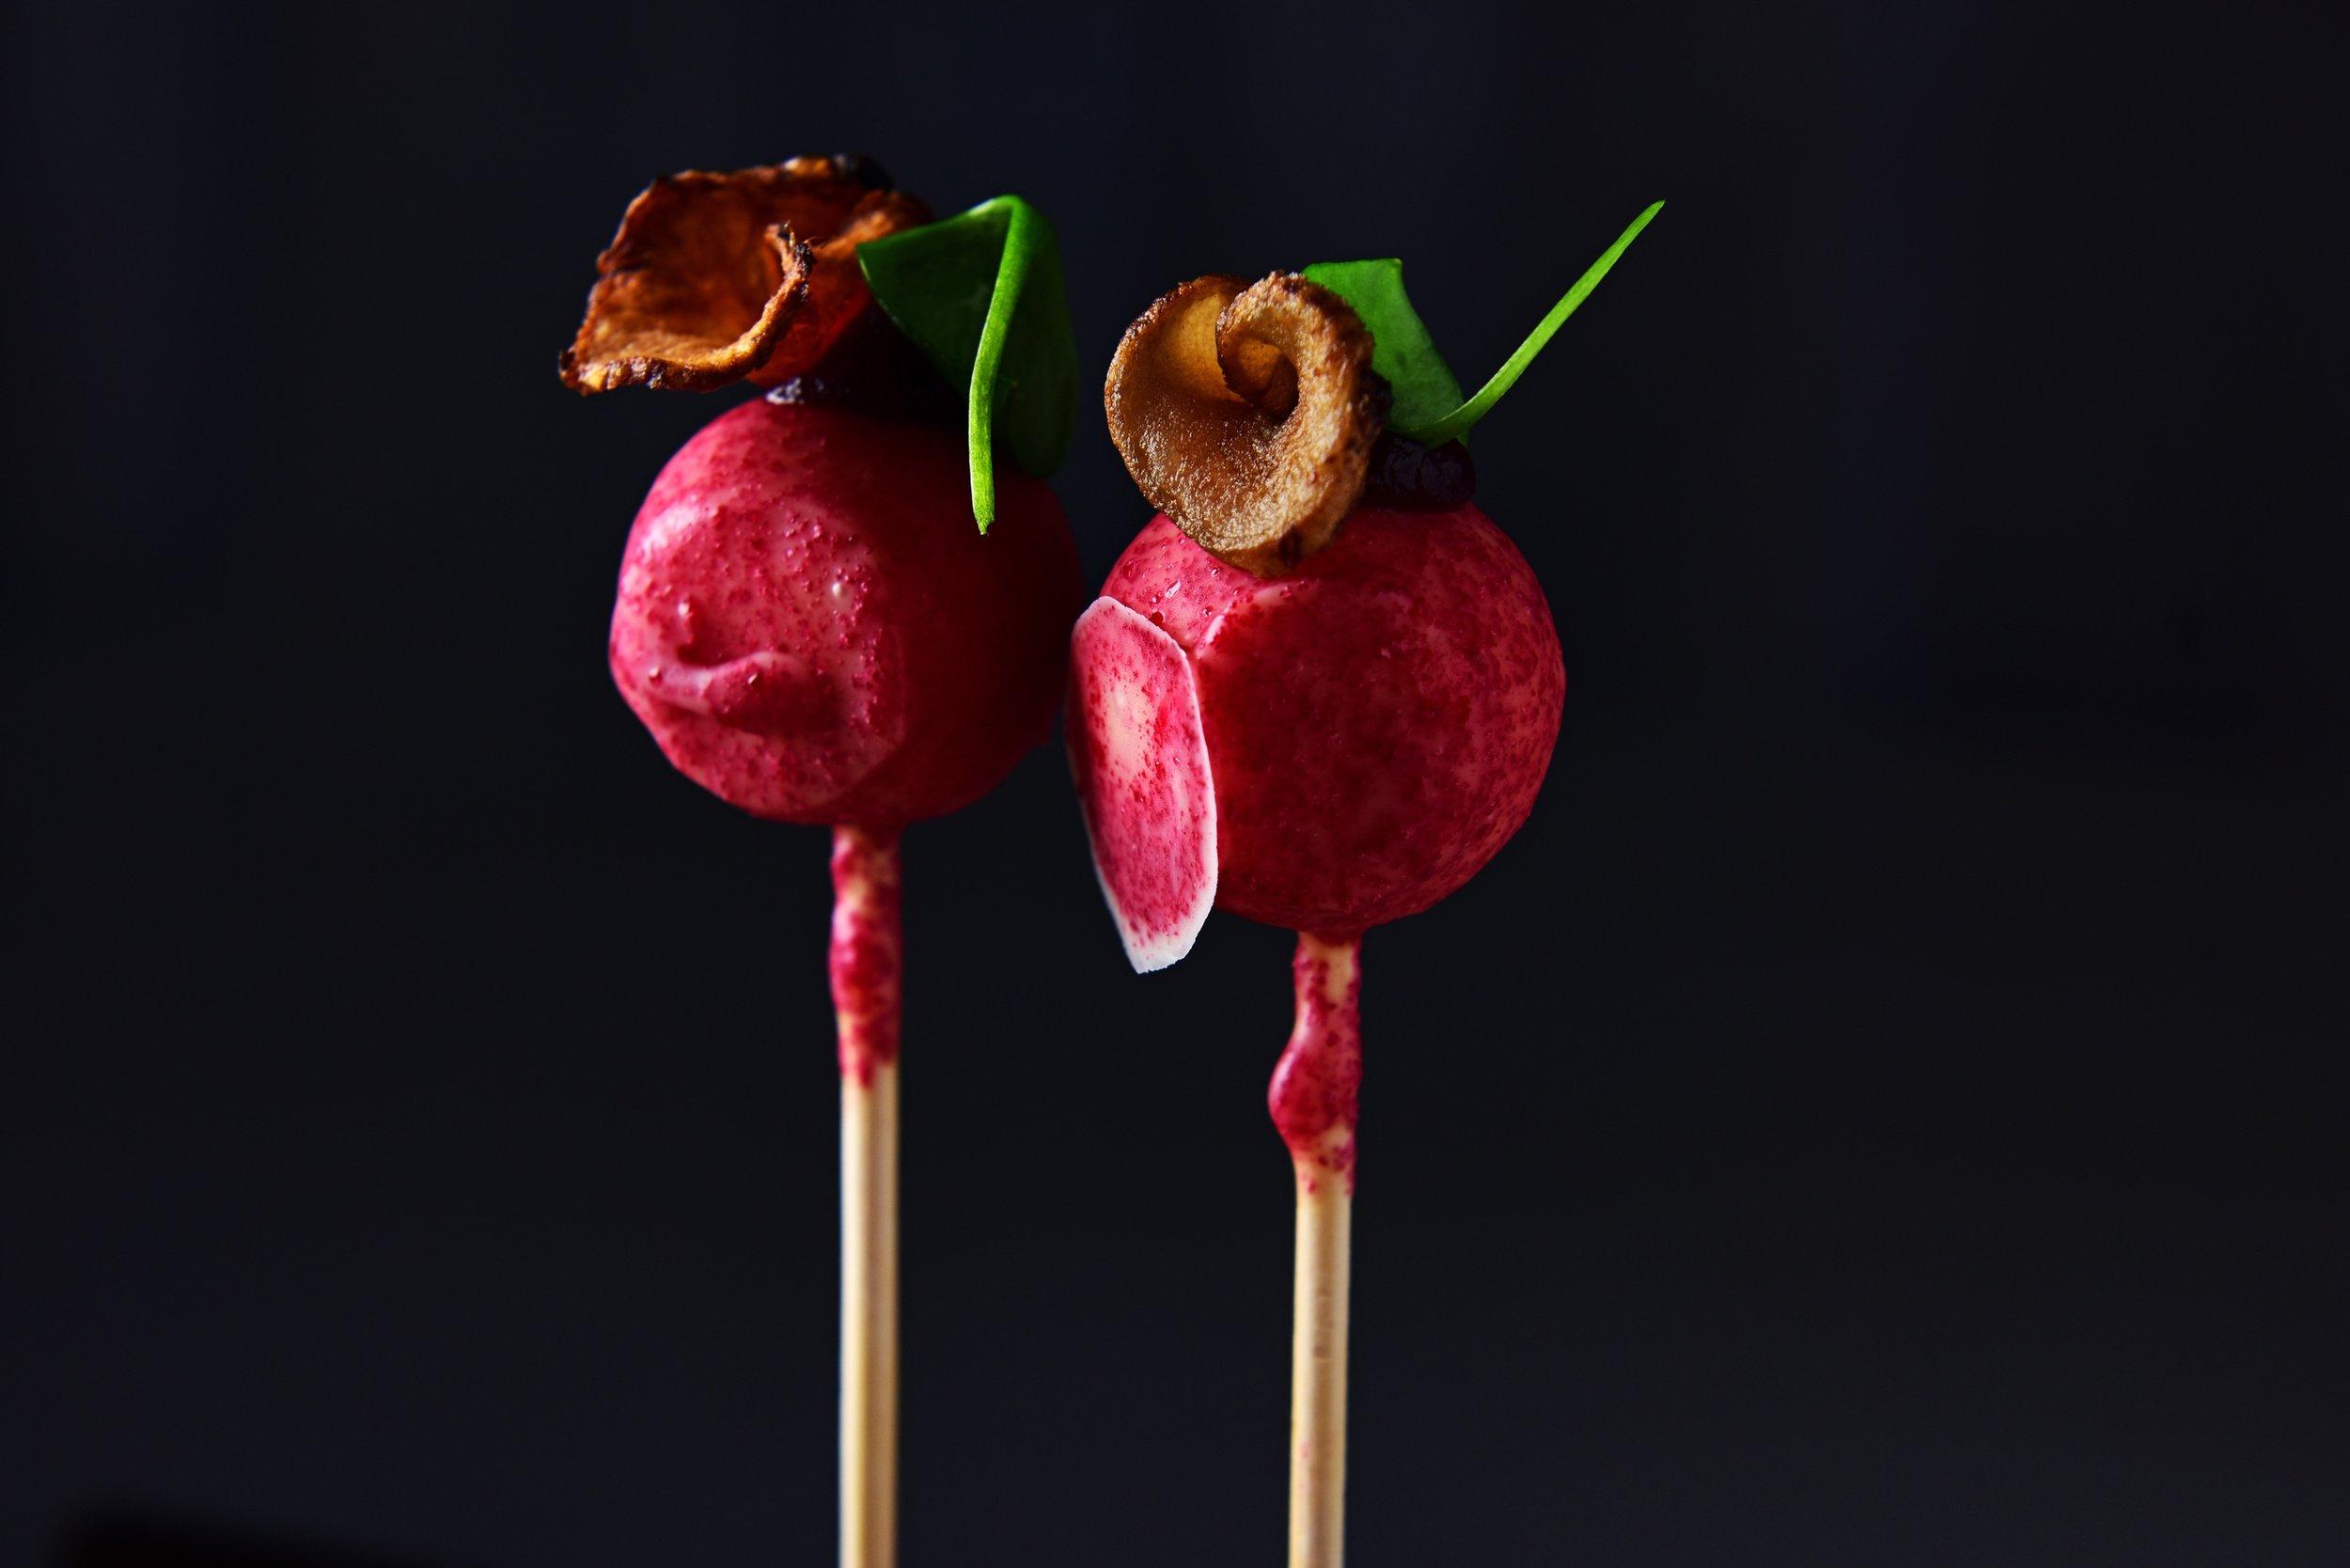 8 restaurant de bakermat ninove tablefever bart albrecht culinair fotograaf.jpg